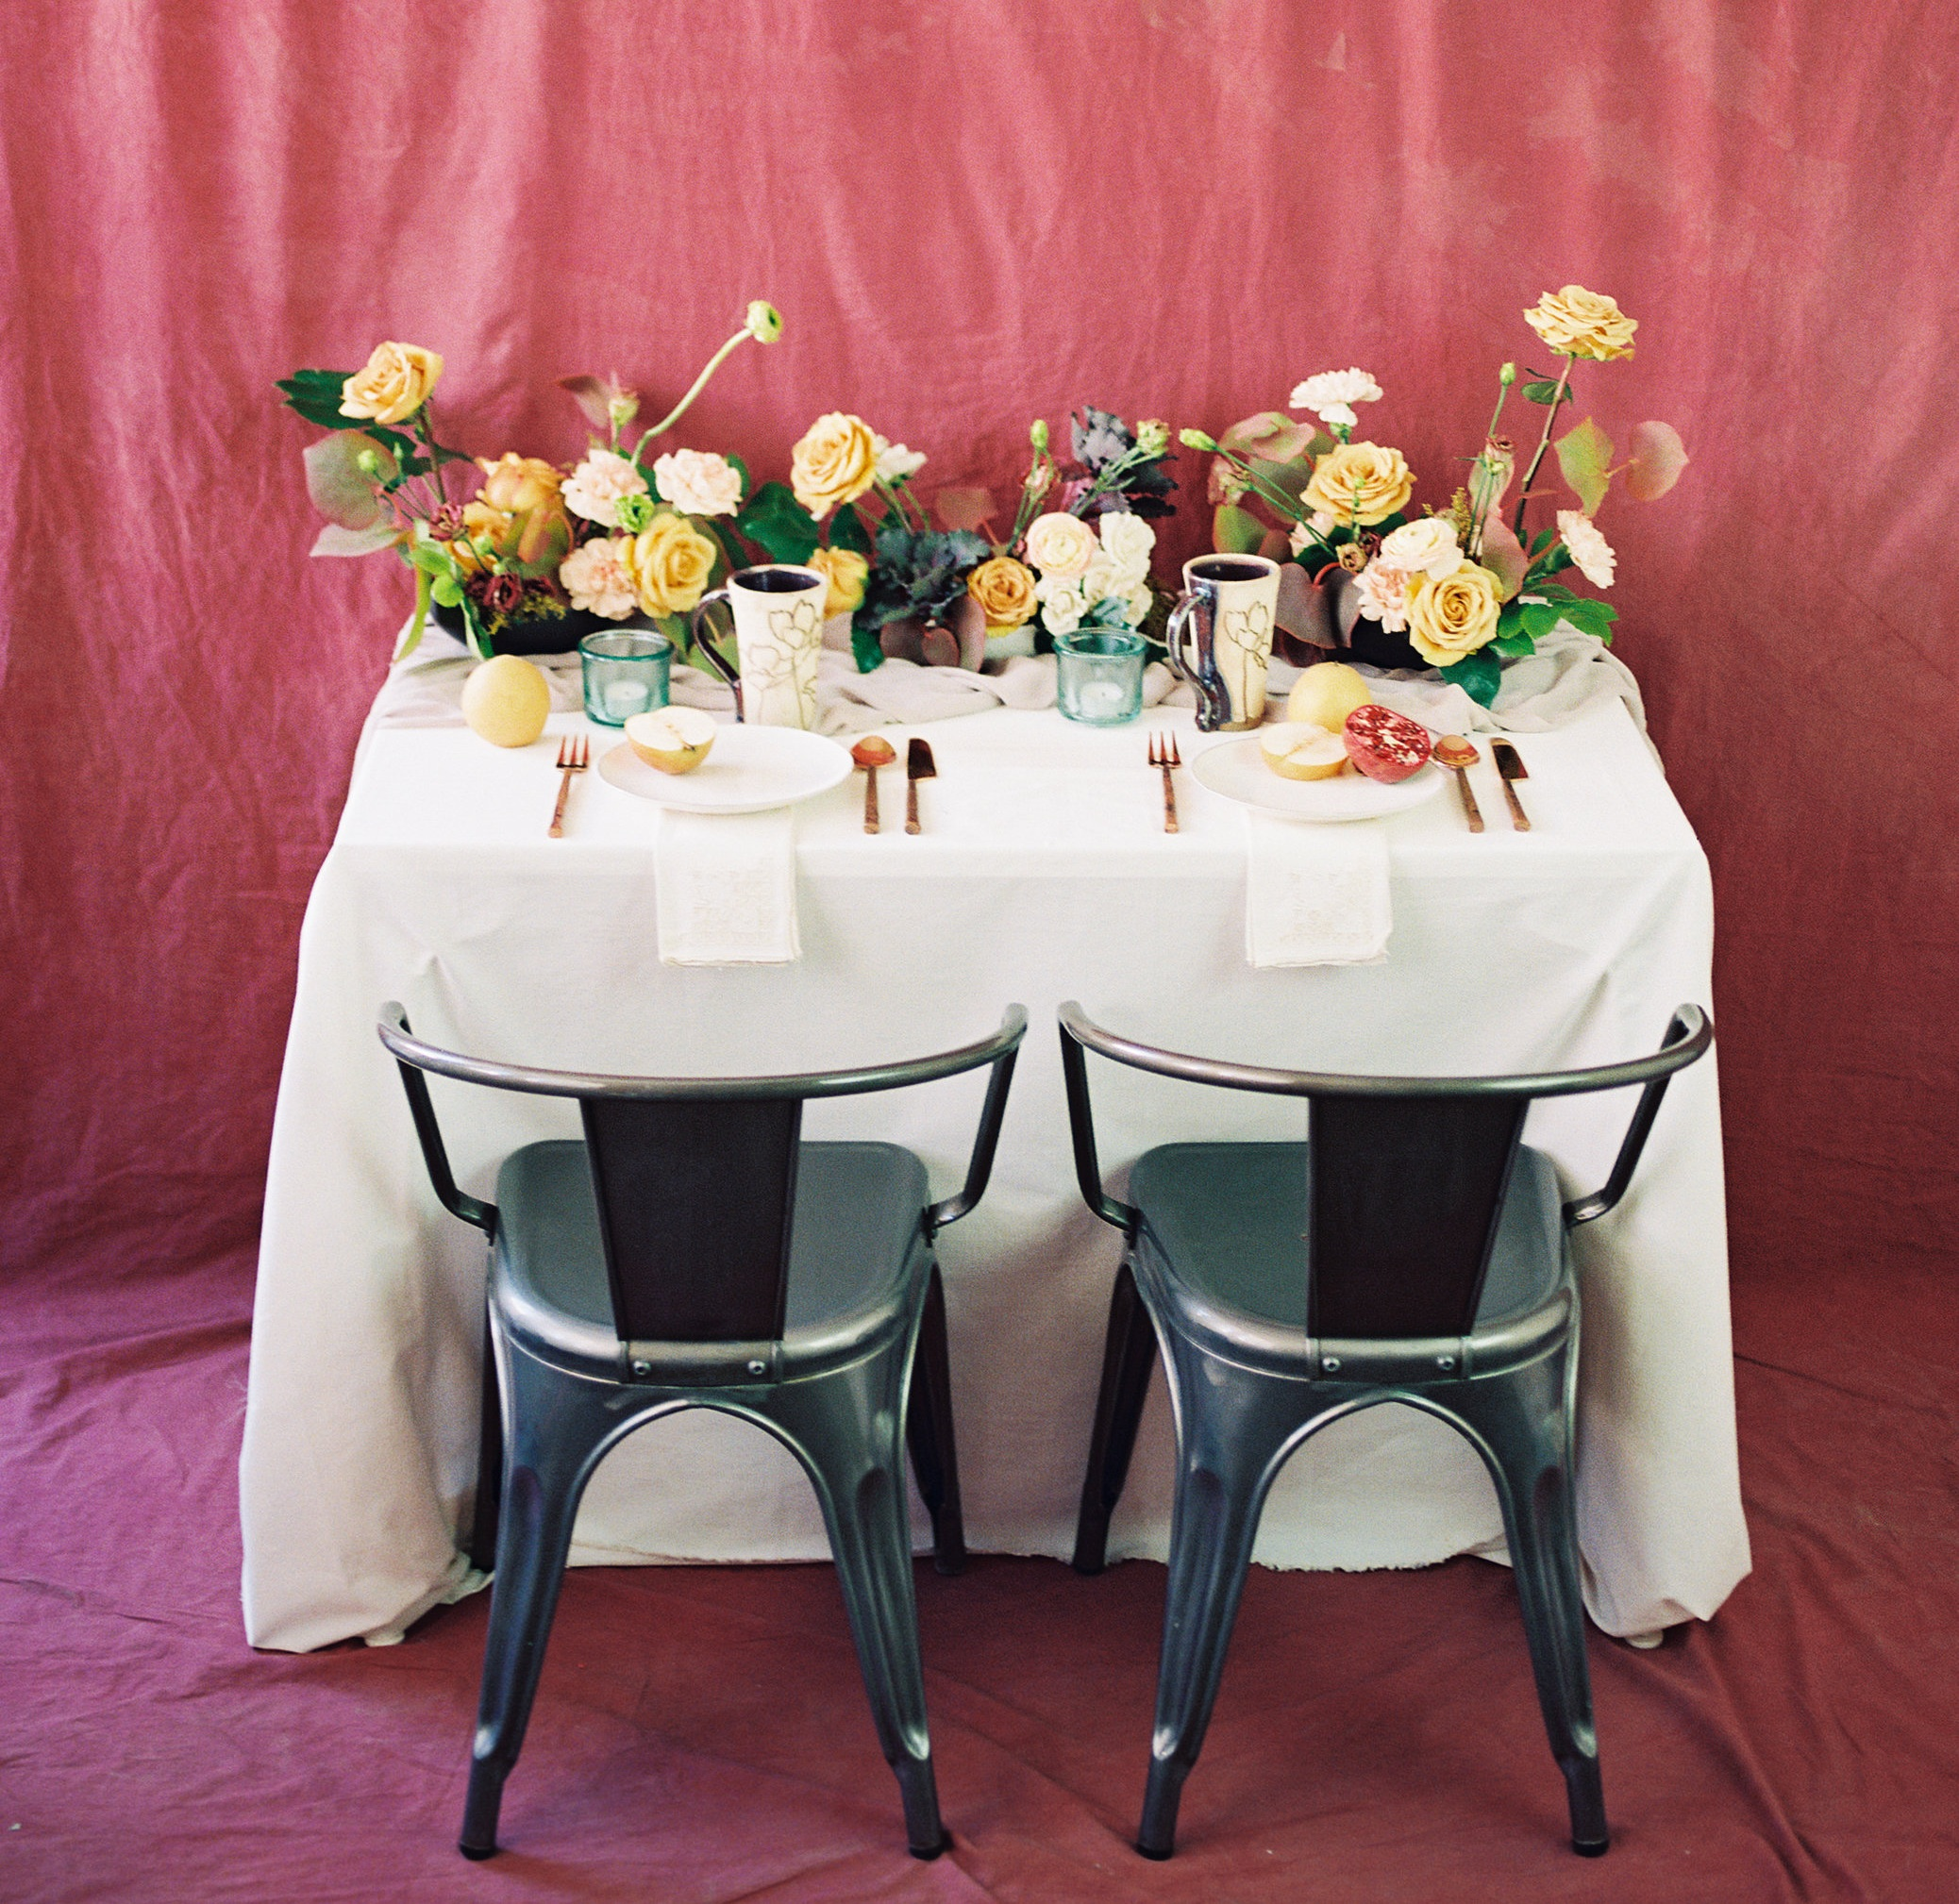 MaryEditorial-Peaches&TwineFilmPhotography-30.jpg